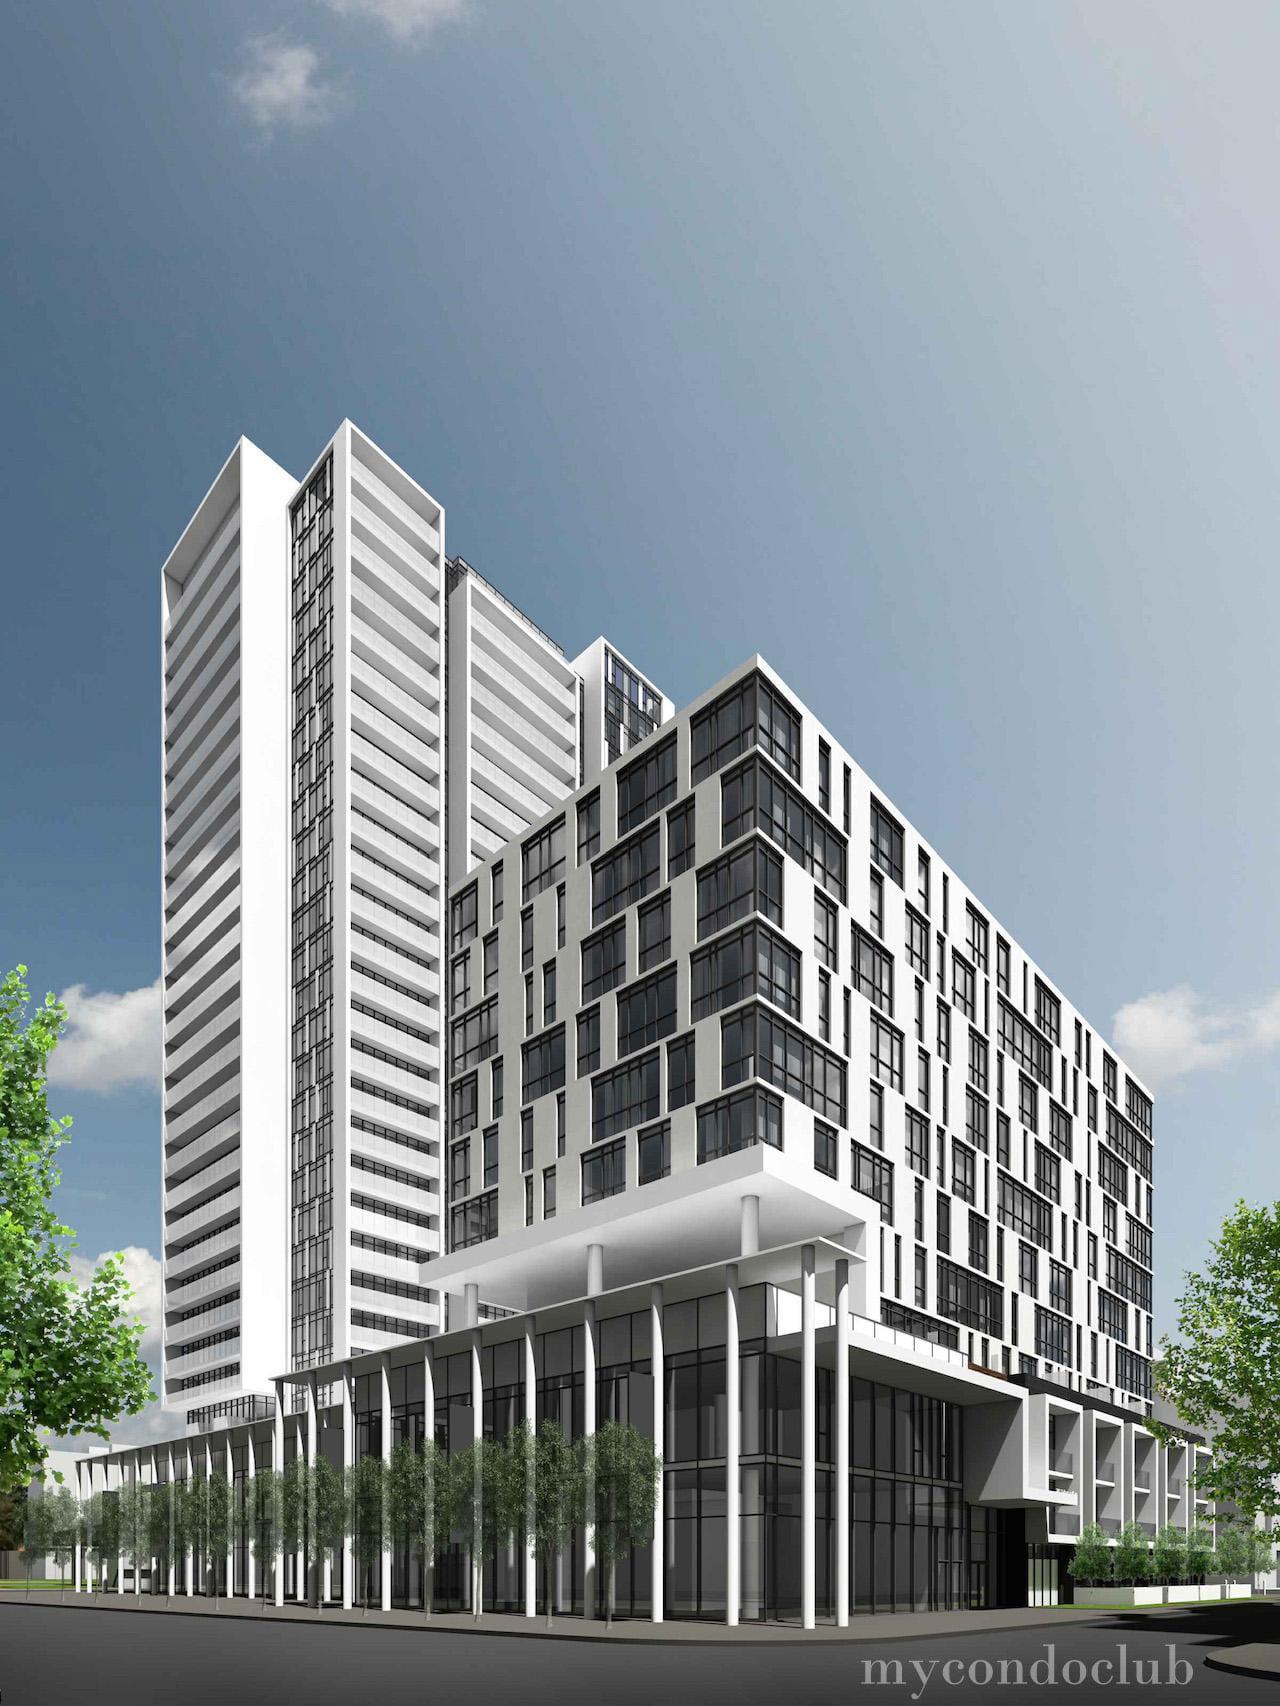 DuEast-condo-tower-danielscorporation-DanielsDuEastCondominium225-SumachStreet-toronto-mycondoclub